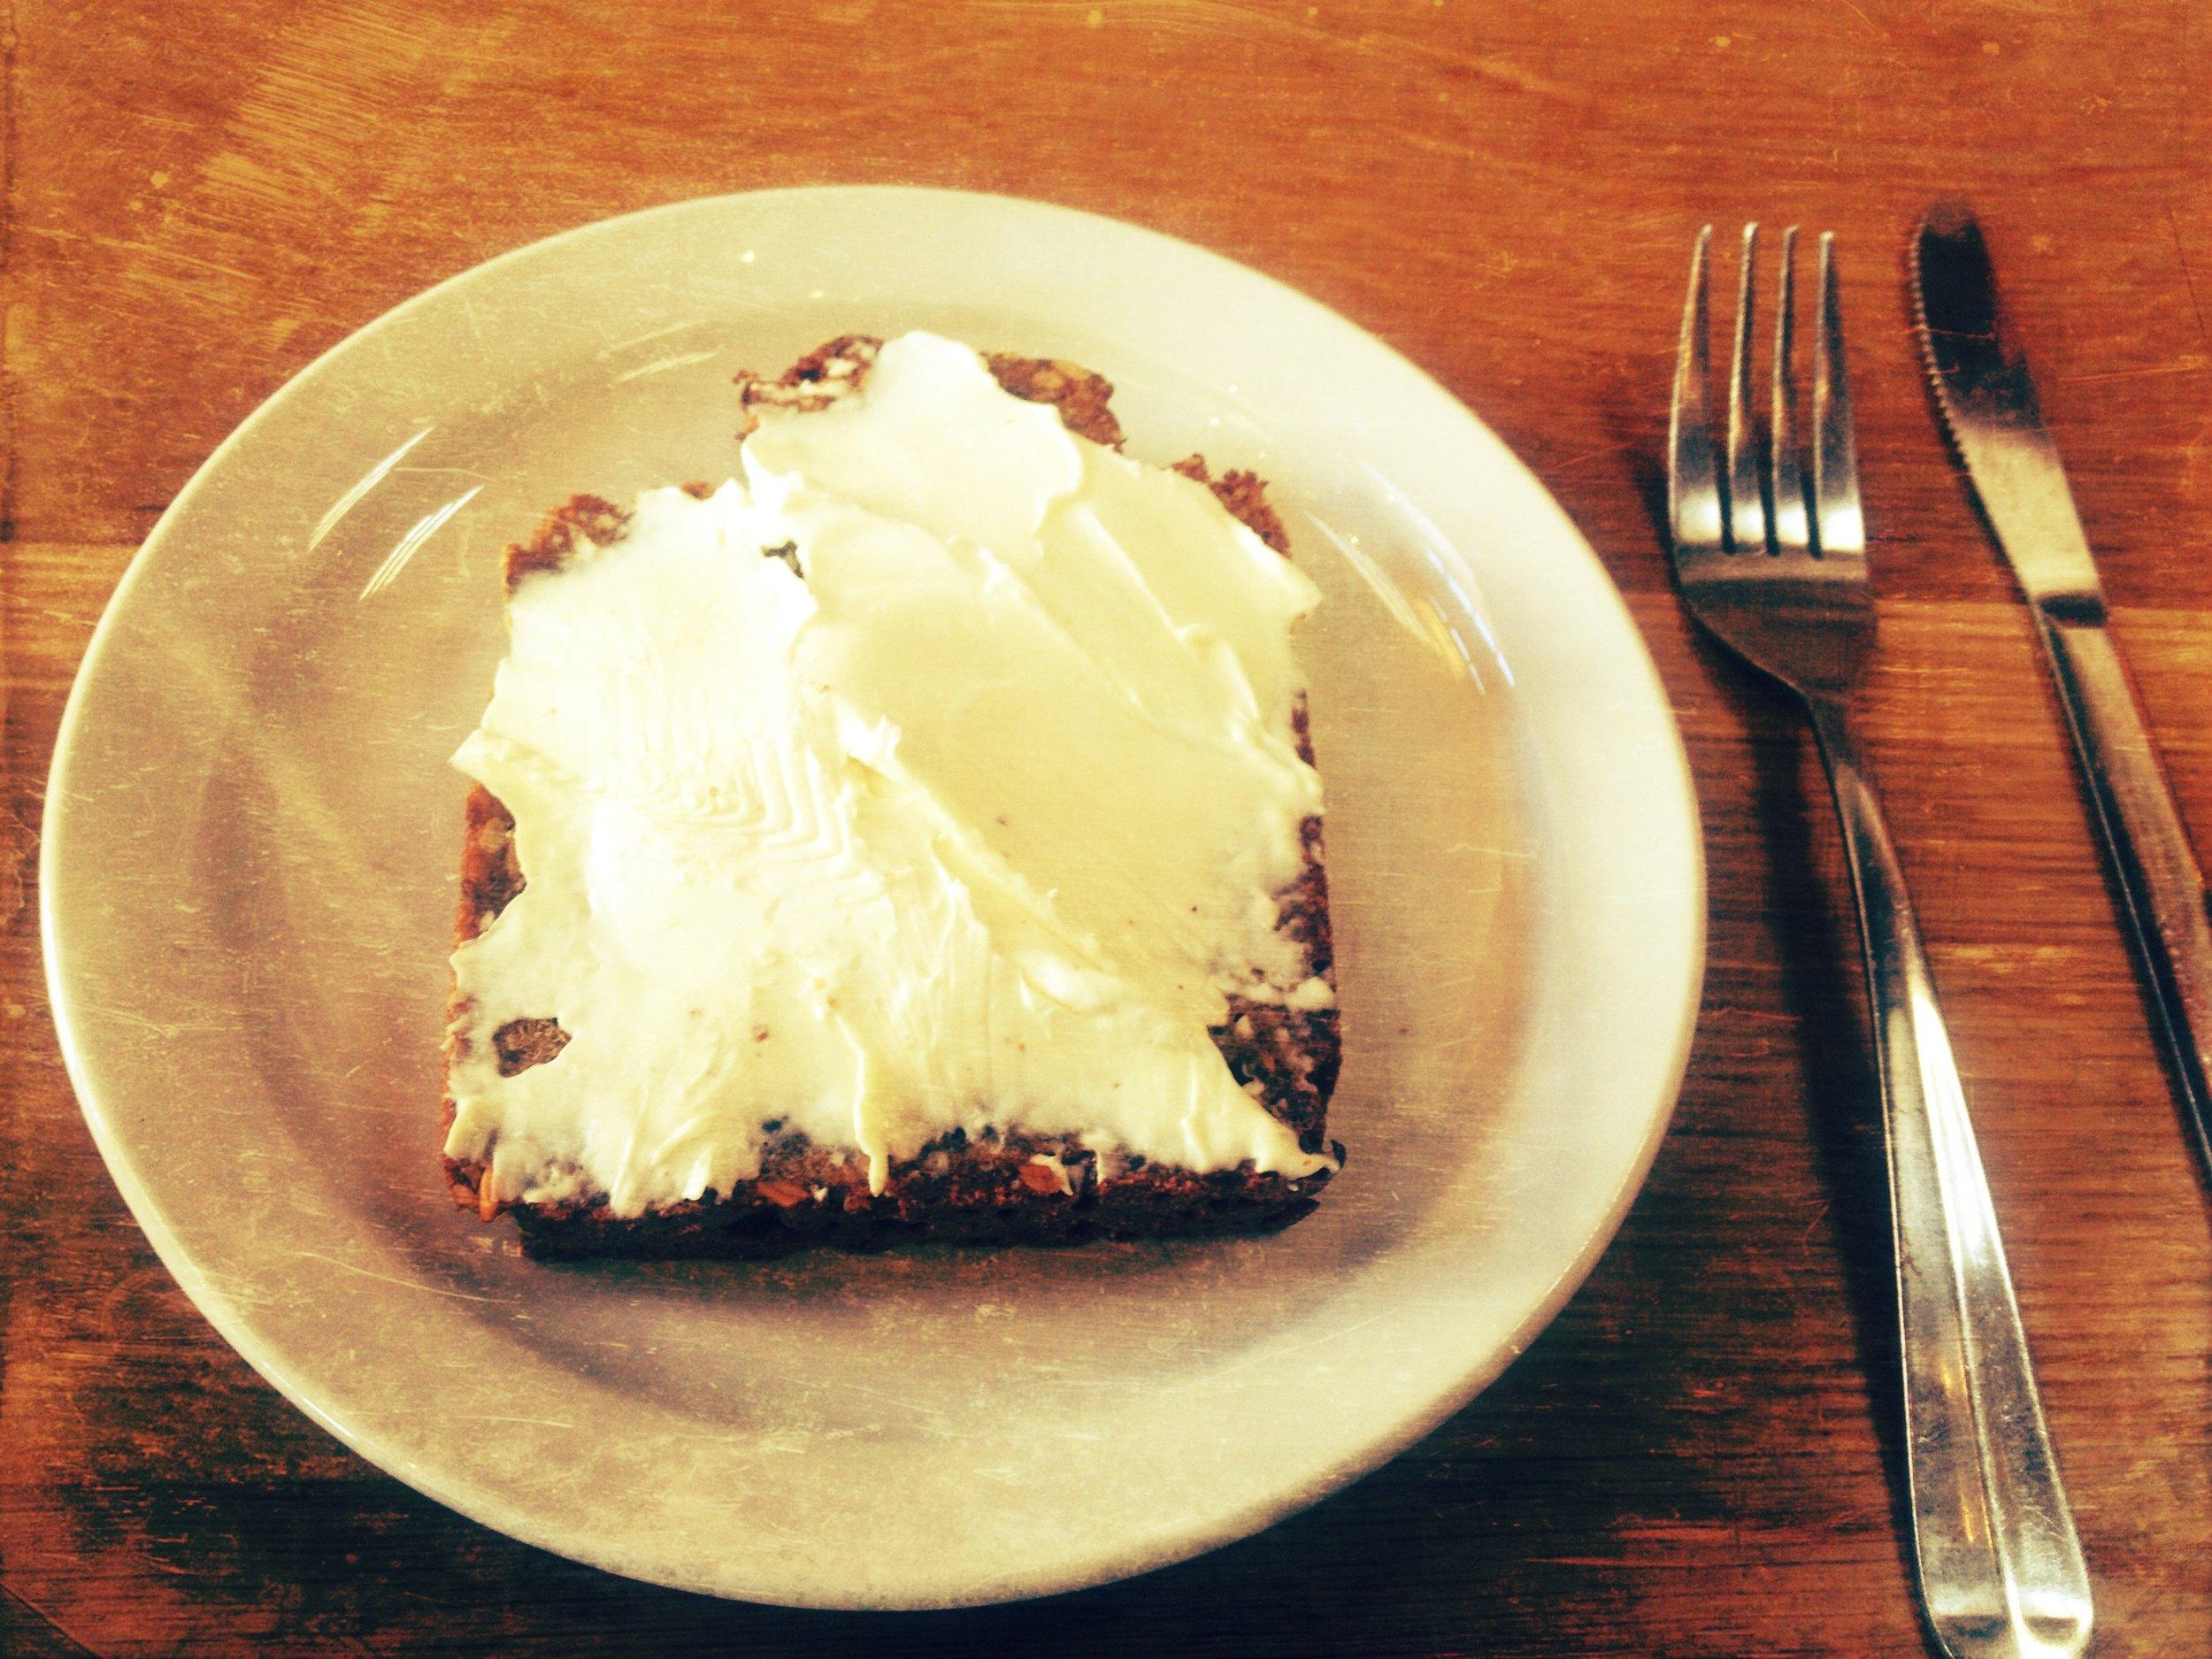 Rye toast & cream cheese at The Mill. Hail yeah.